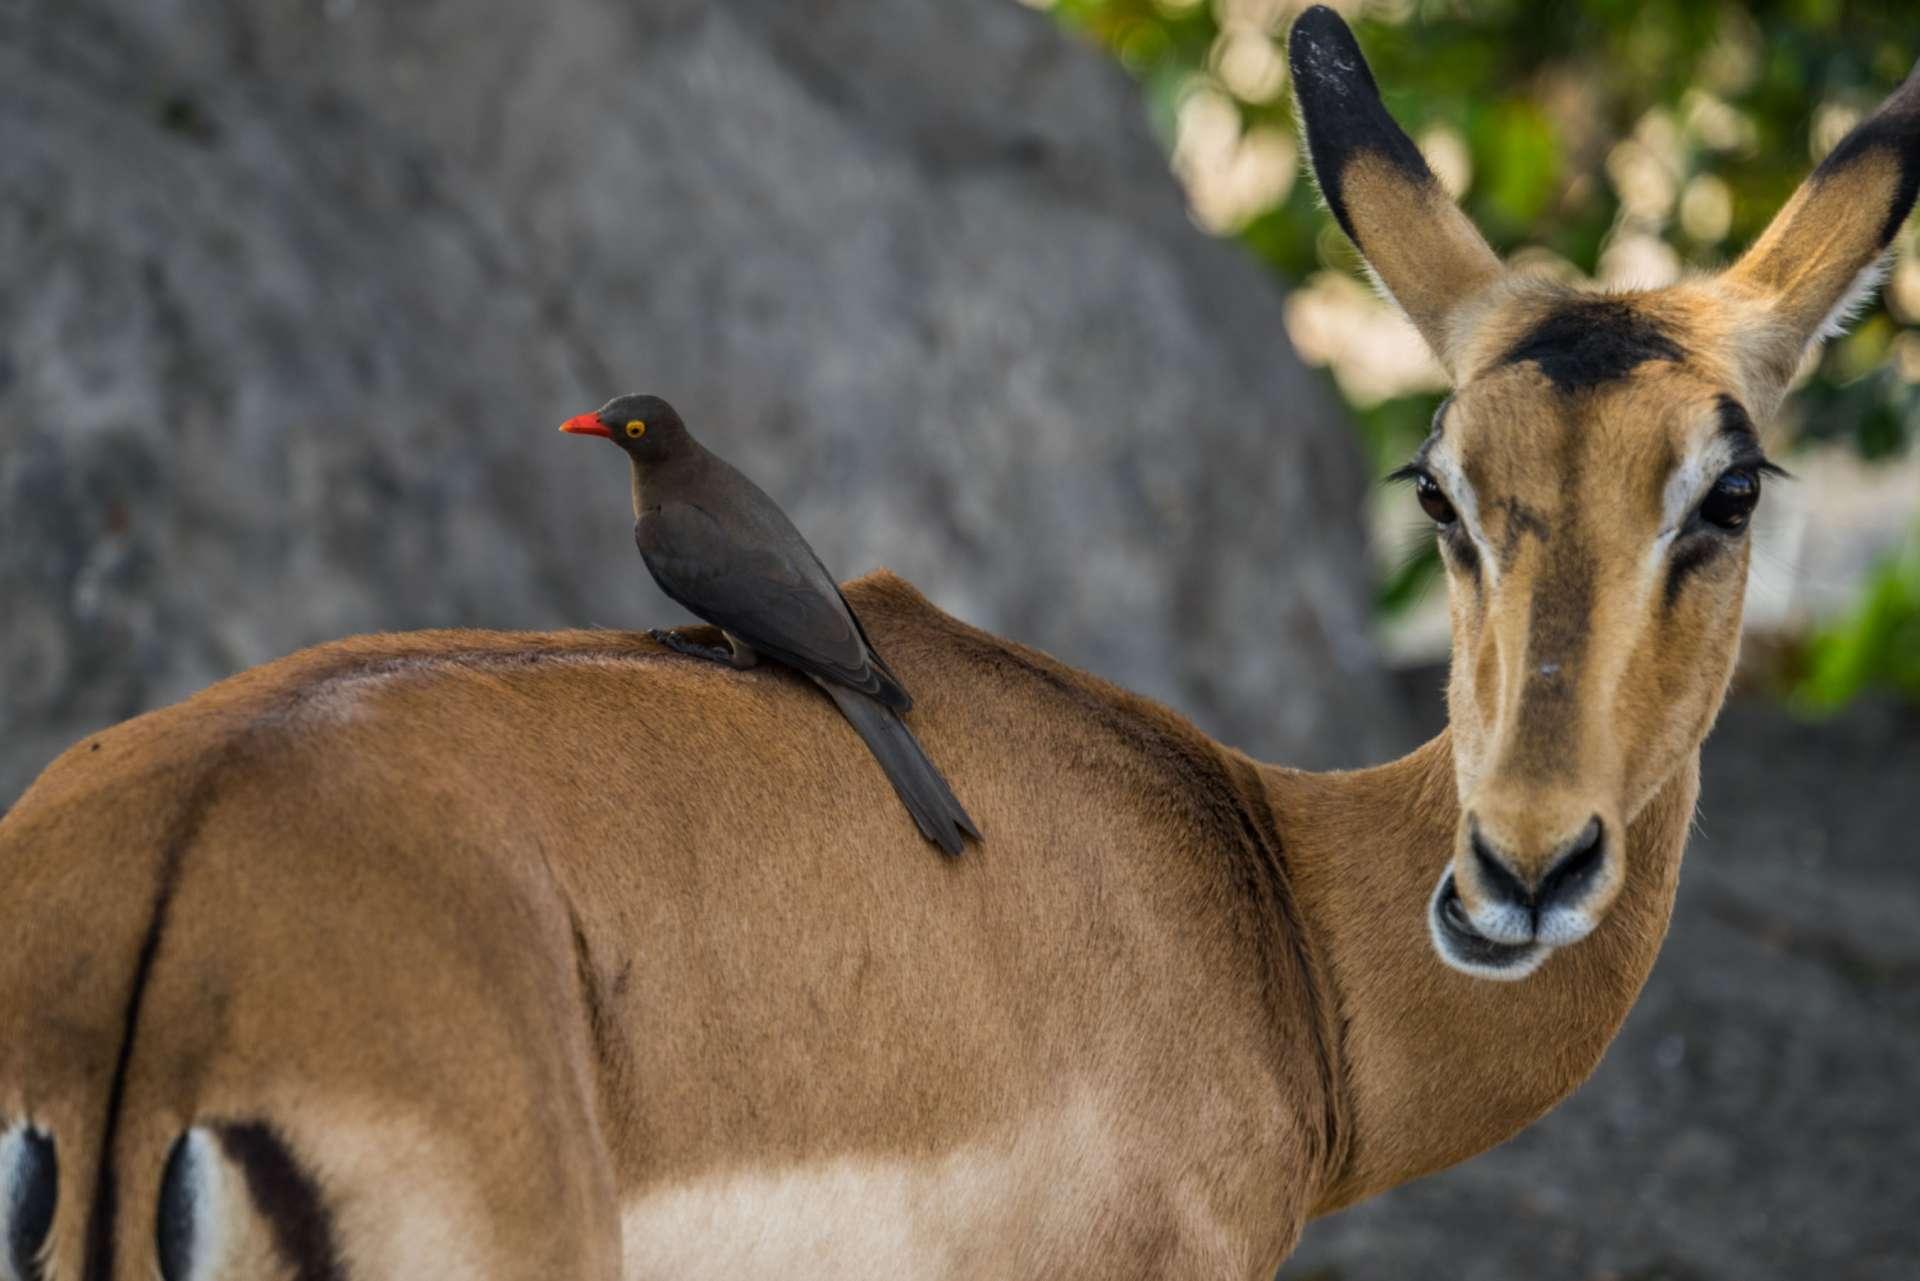 Victoria Falls Zimbawe Enrico Pescantini Chobe day trip safari 2